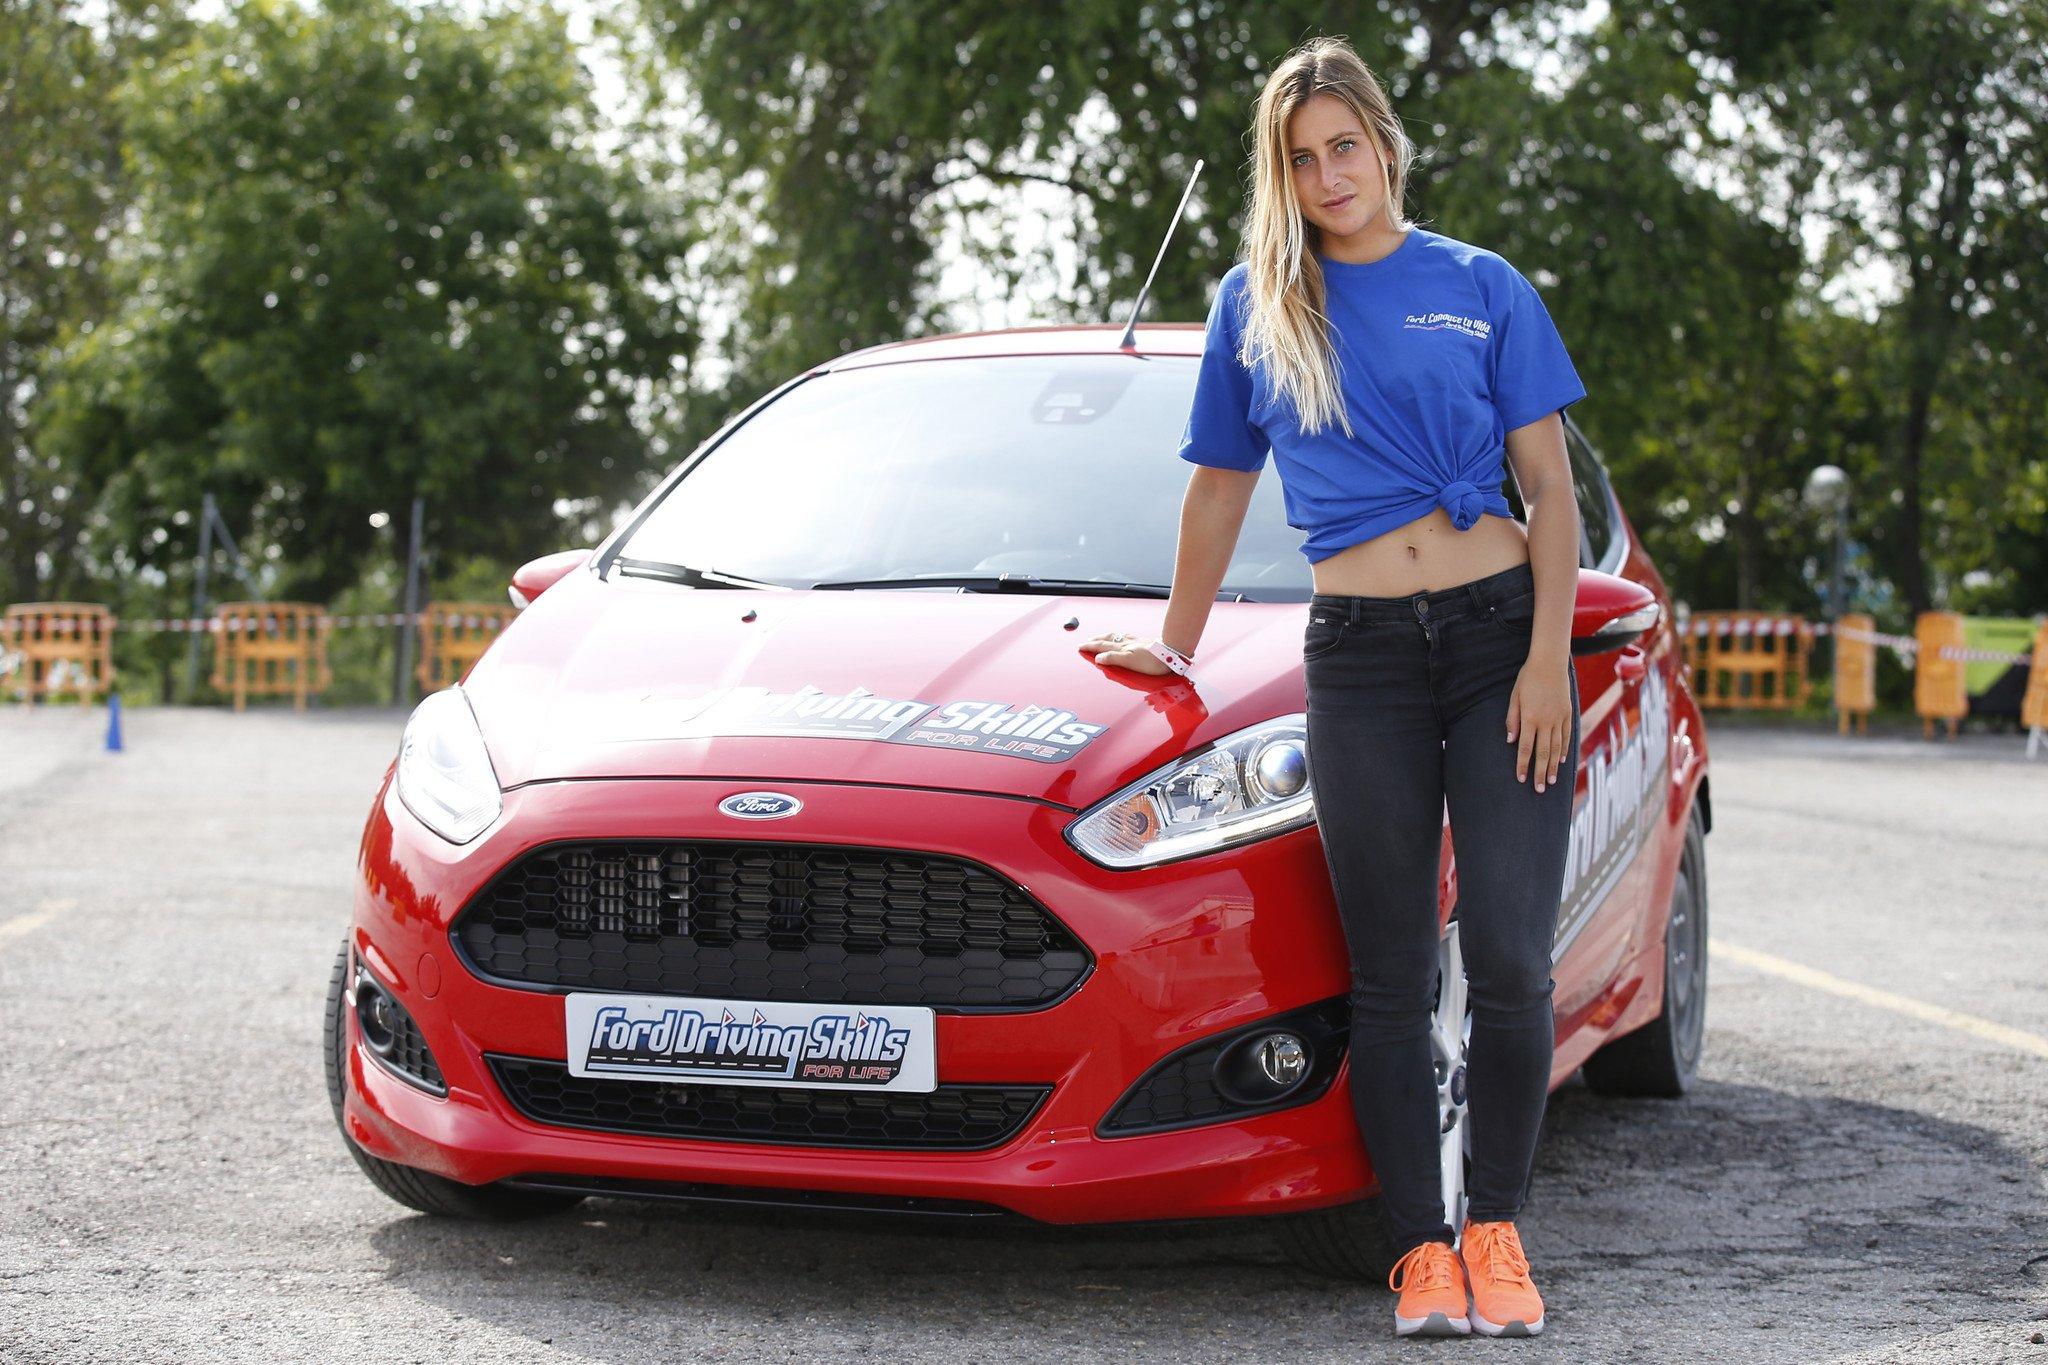 'Ford, Conduce tu Vida' 2016